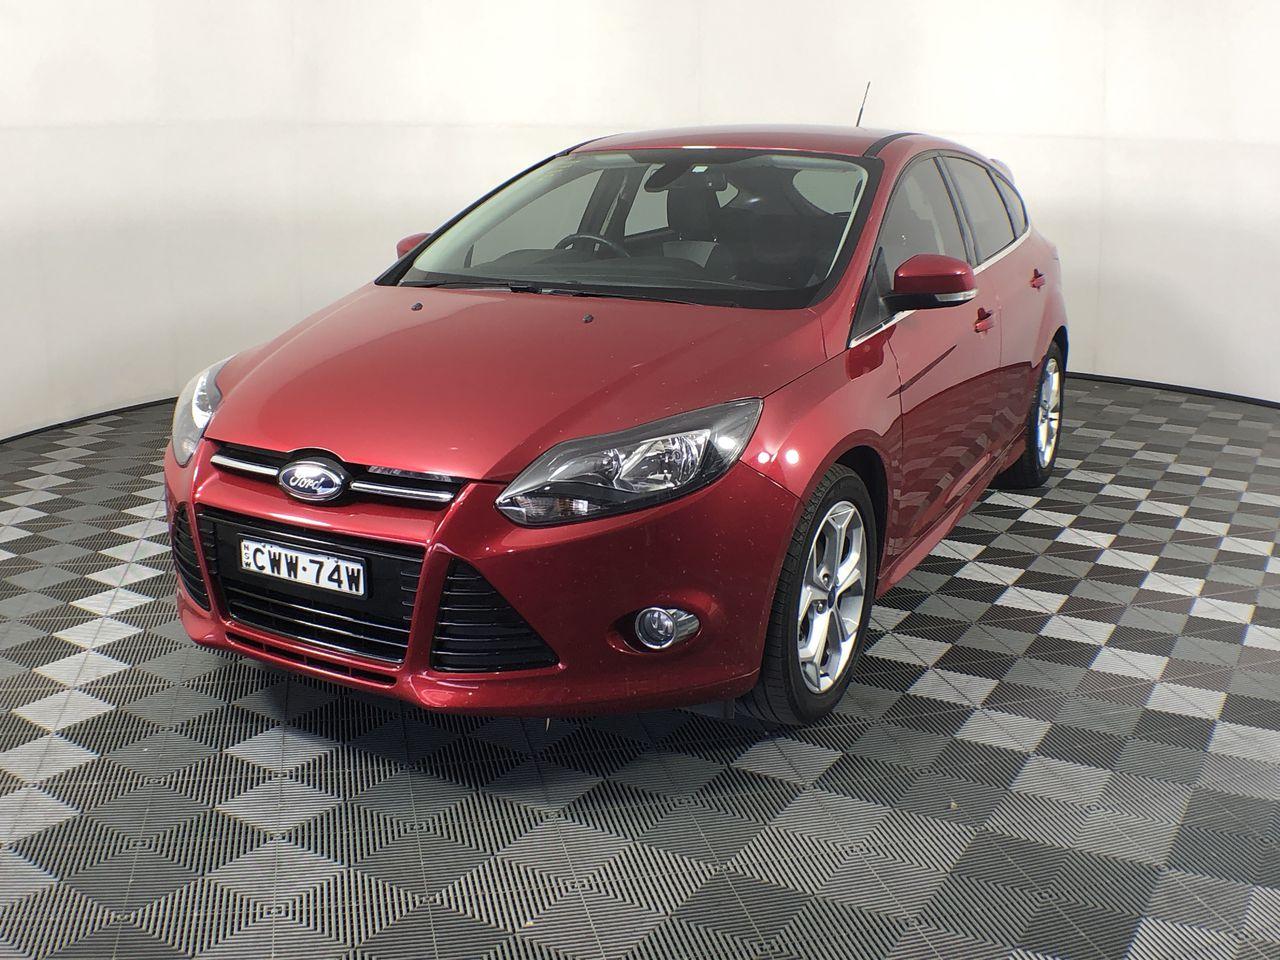 2014 Ford Focus Sport LW II Manual Hatchback